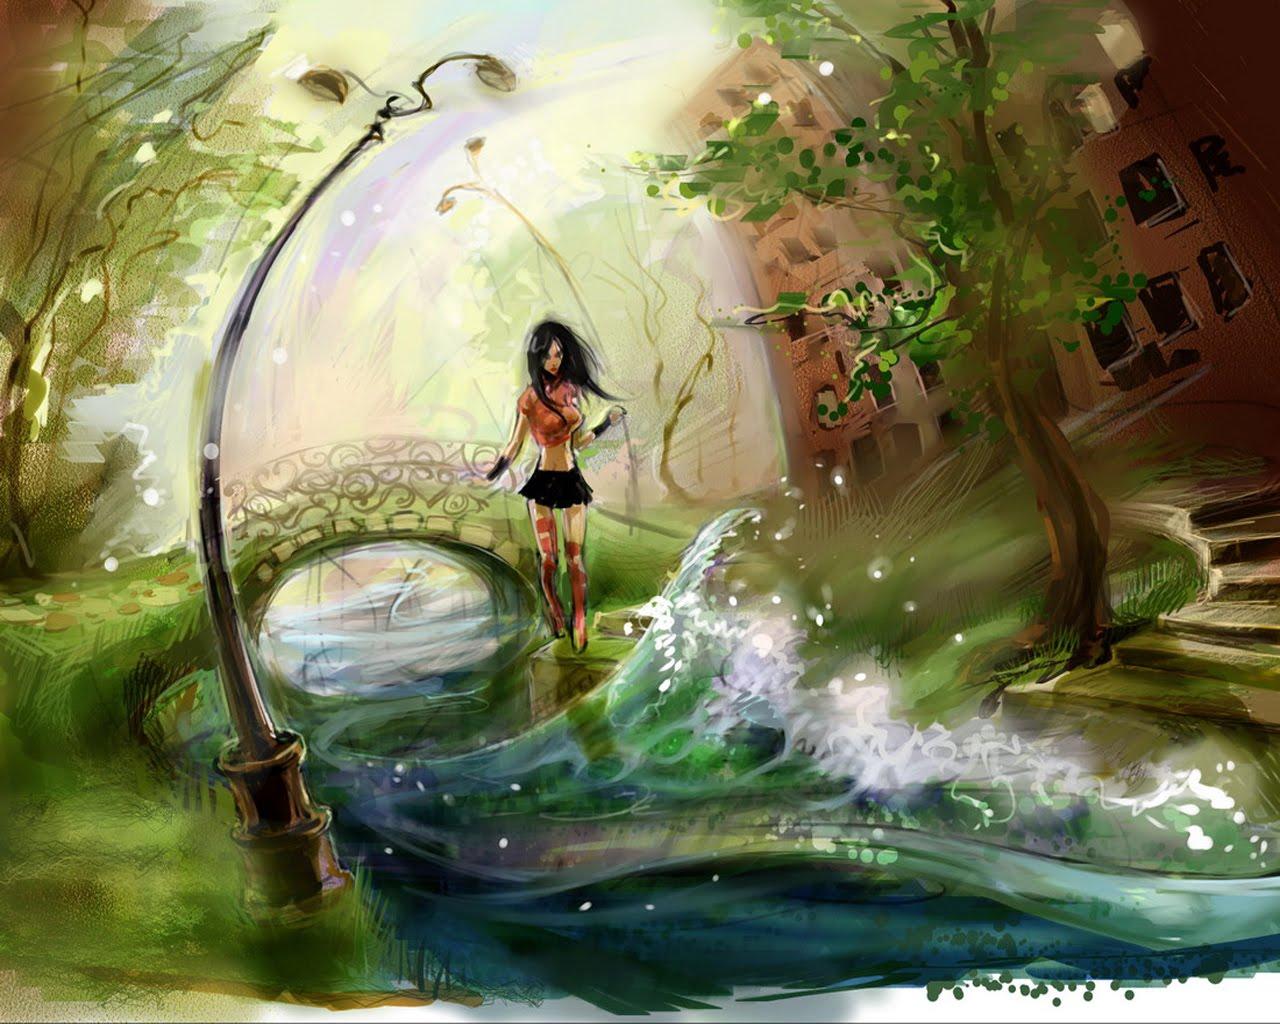 Alone Girl Wallpaper Hd Download Beautiful Women Artistic Paintings Desktop Backgrounds